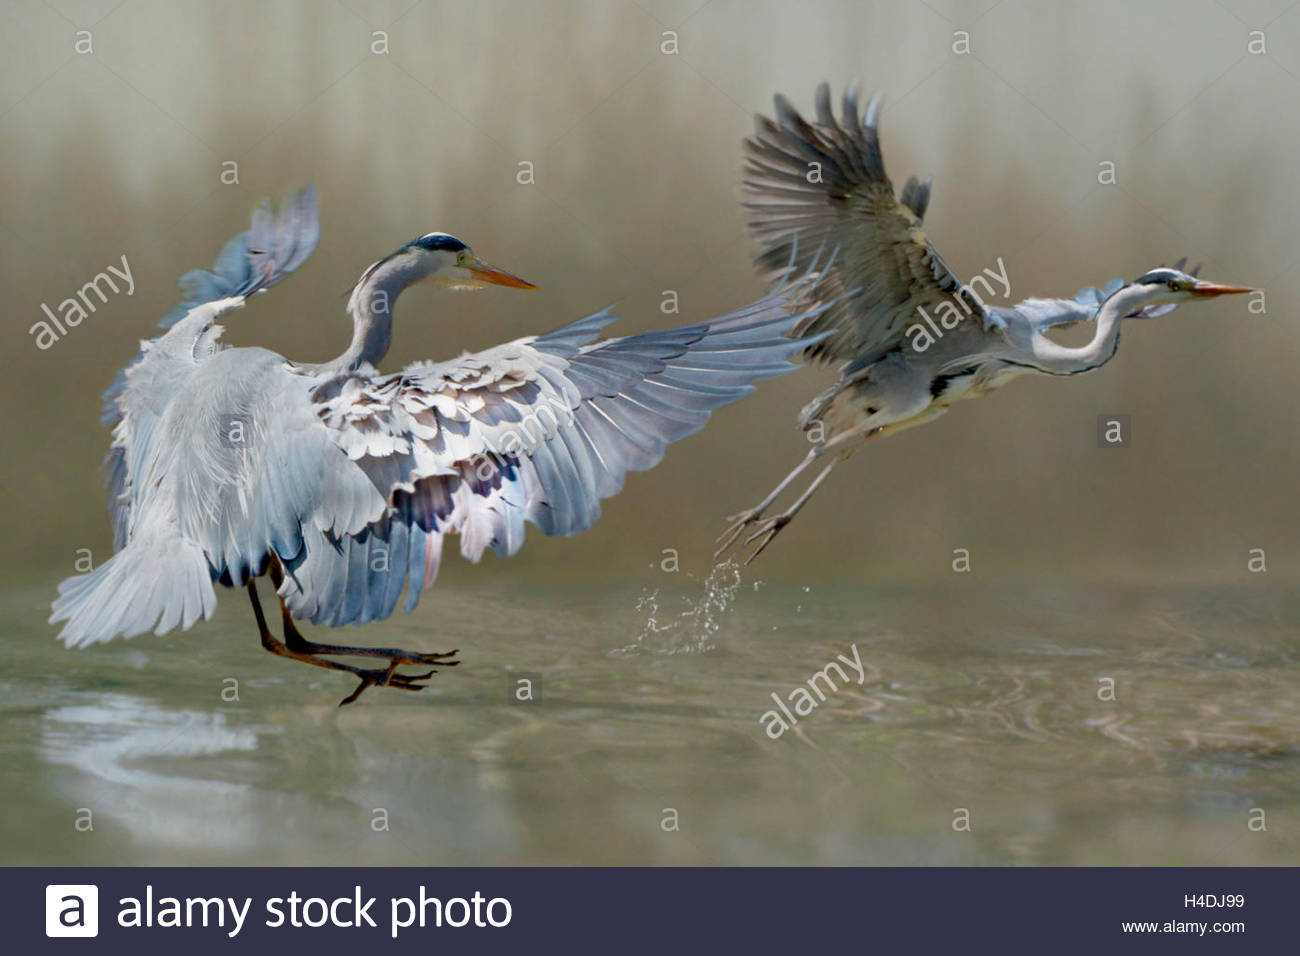 Grey heron, Ardea cinerea, common heron, fight, rival - Stock Image